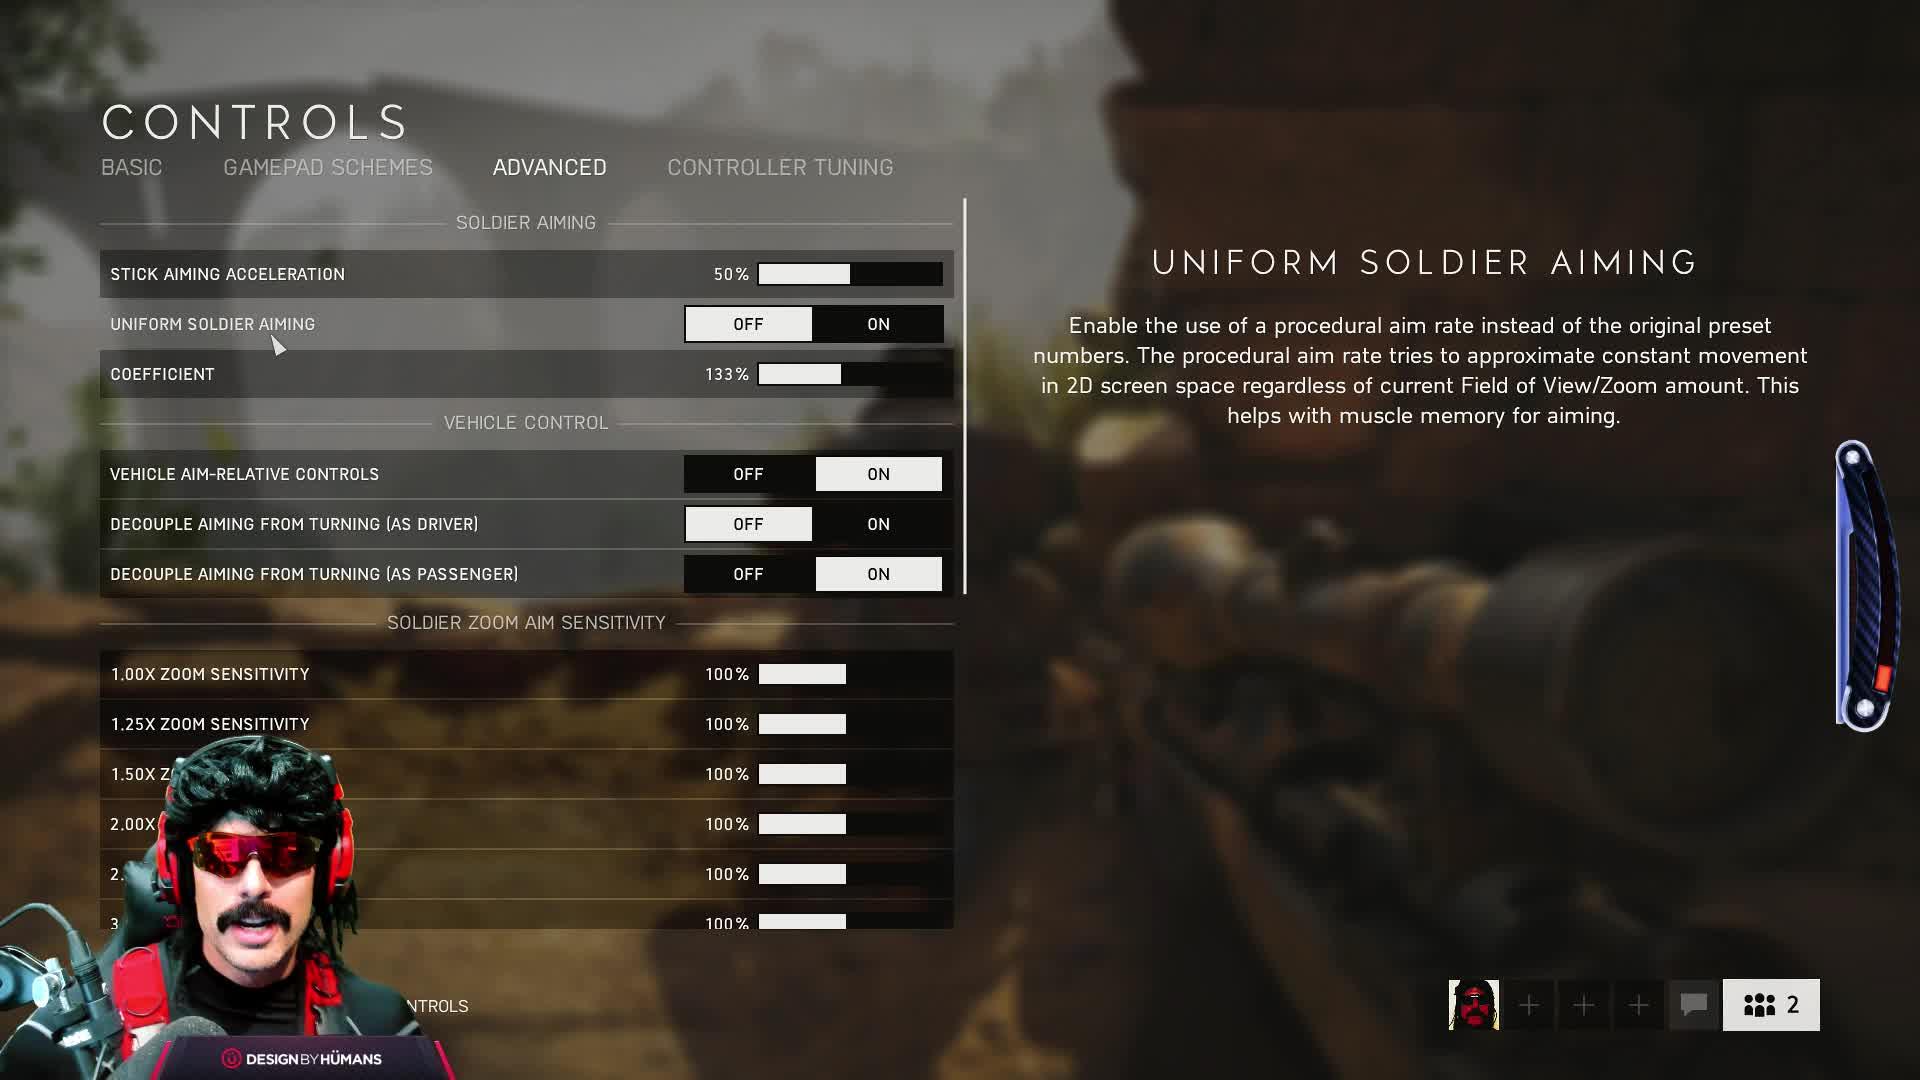 Dr Disrespect on advance settings of Battlefield 5